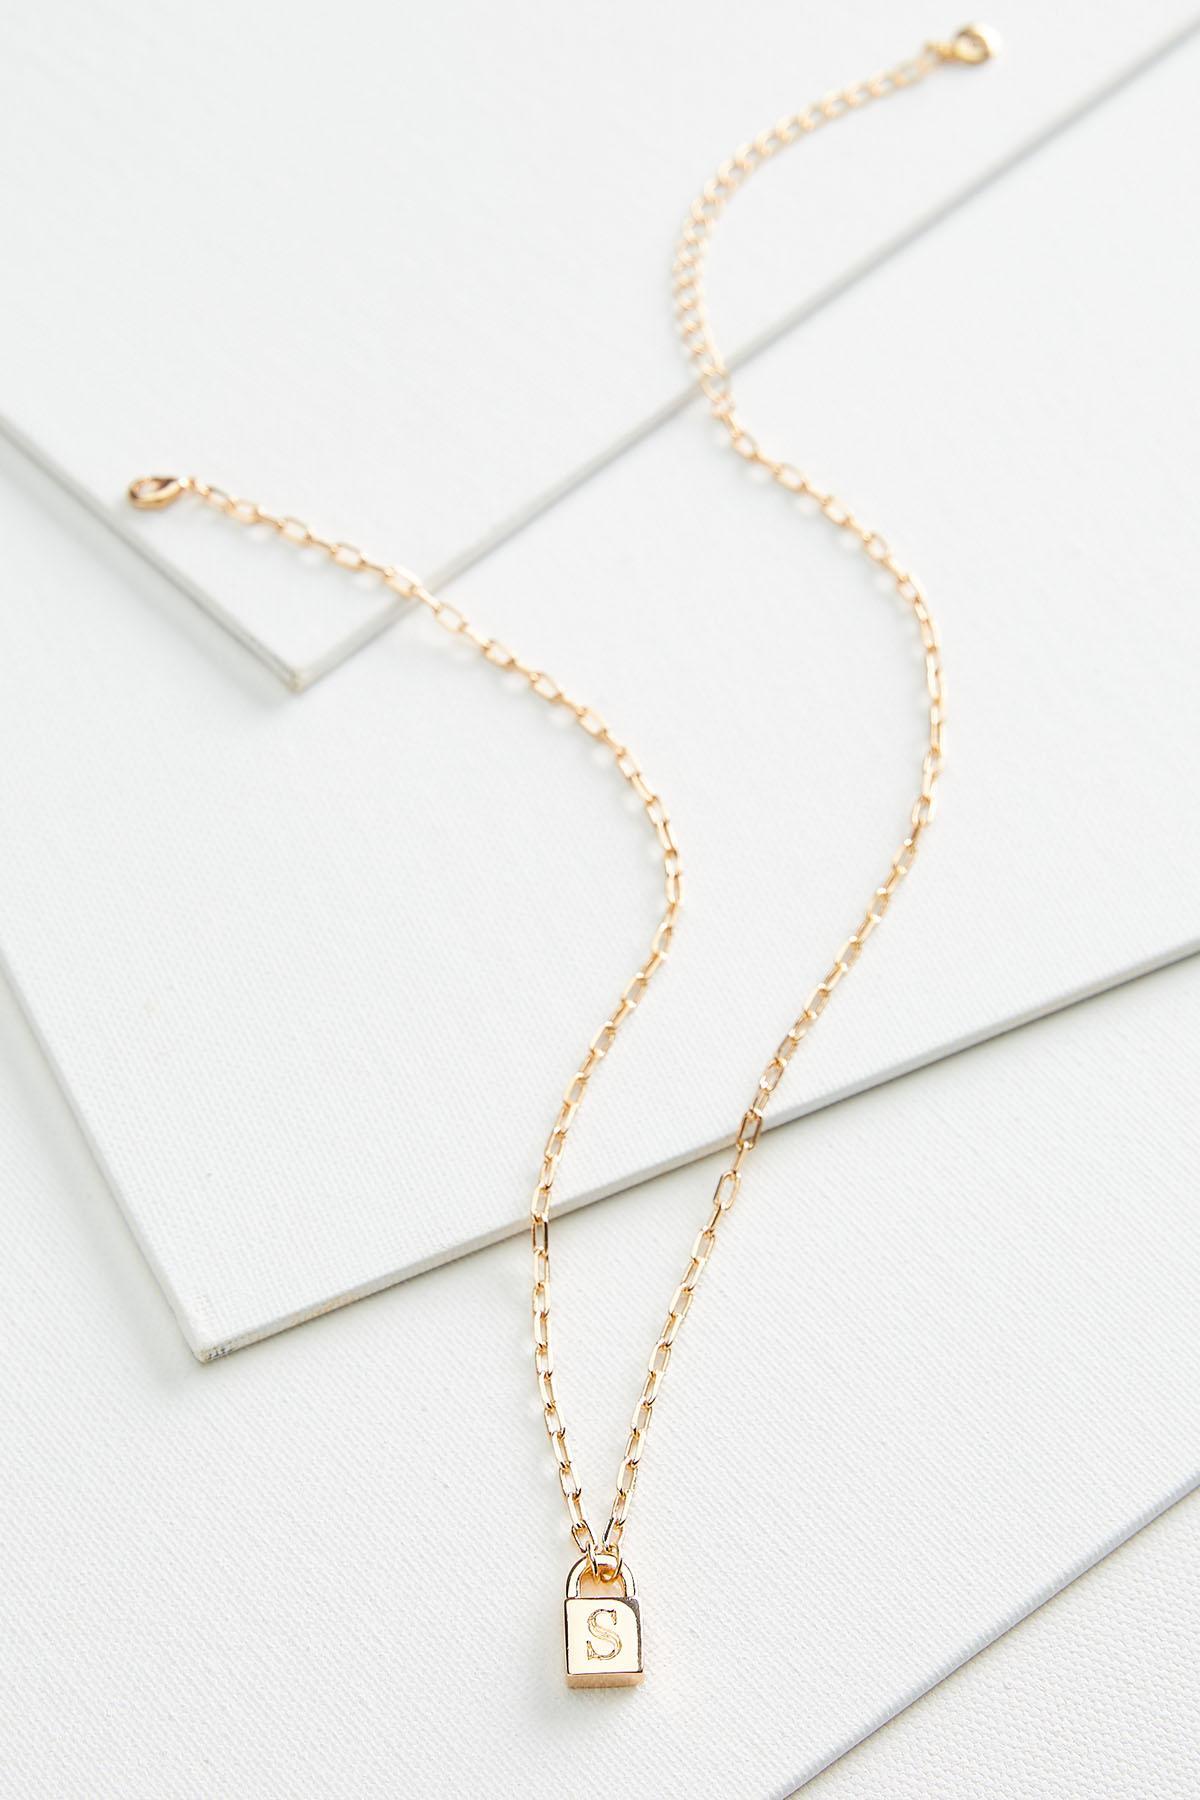 S Locket Pendant Necklace